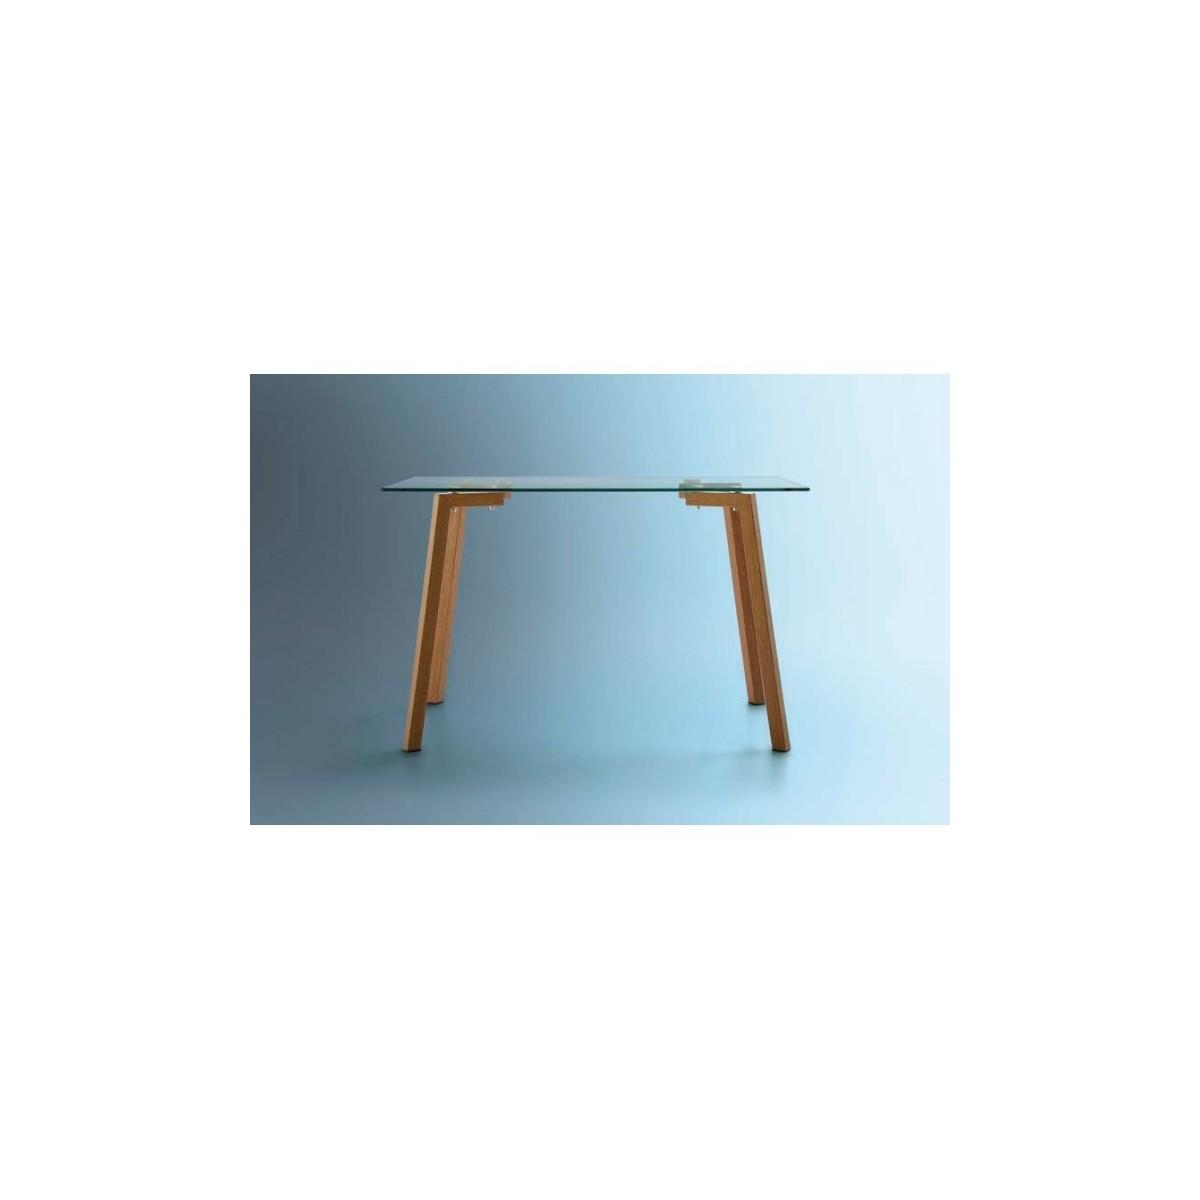 Mesa de comedor moderna modelo nino mubeko for Modelos de mesas de comedor modernas